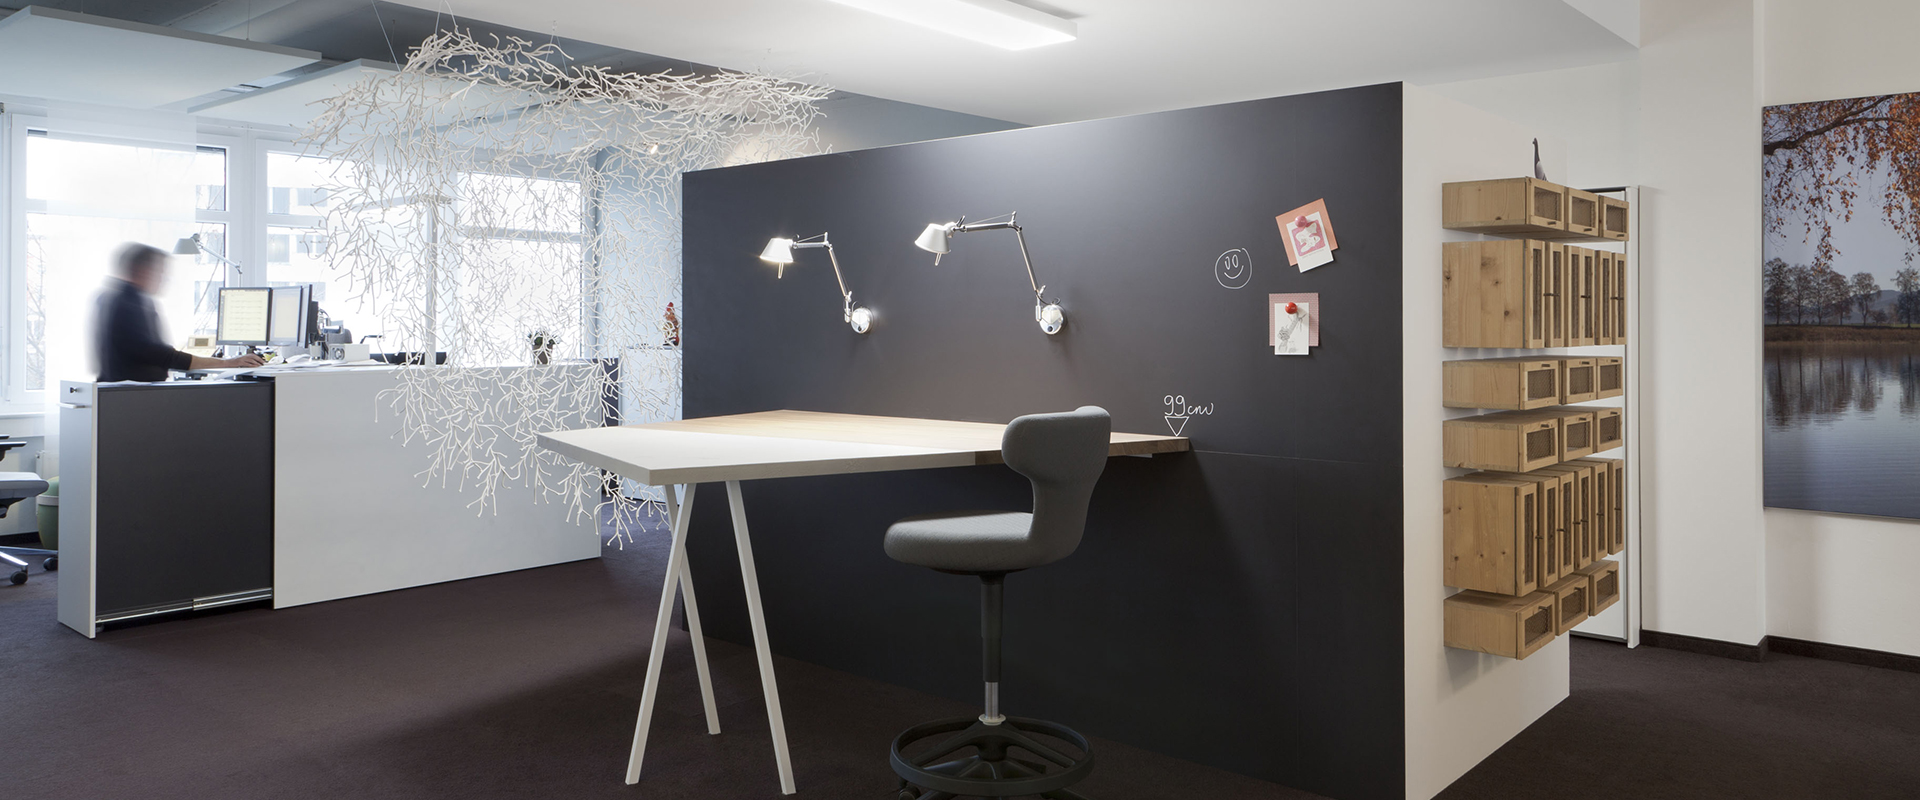 Genial Finanzierung: Clever, Smart U0026 Sicher Zum Neuen Büro Design